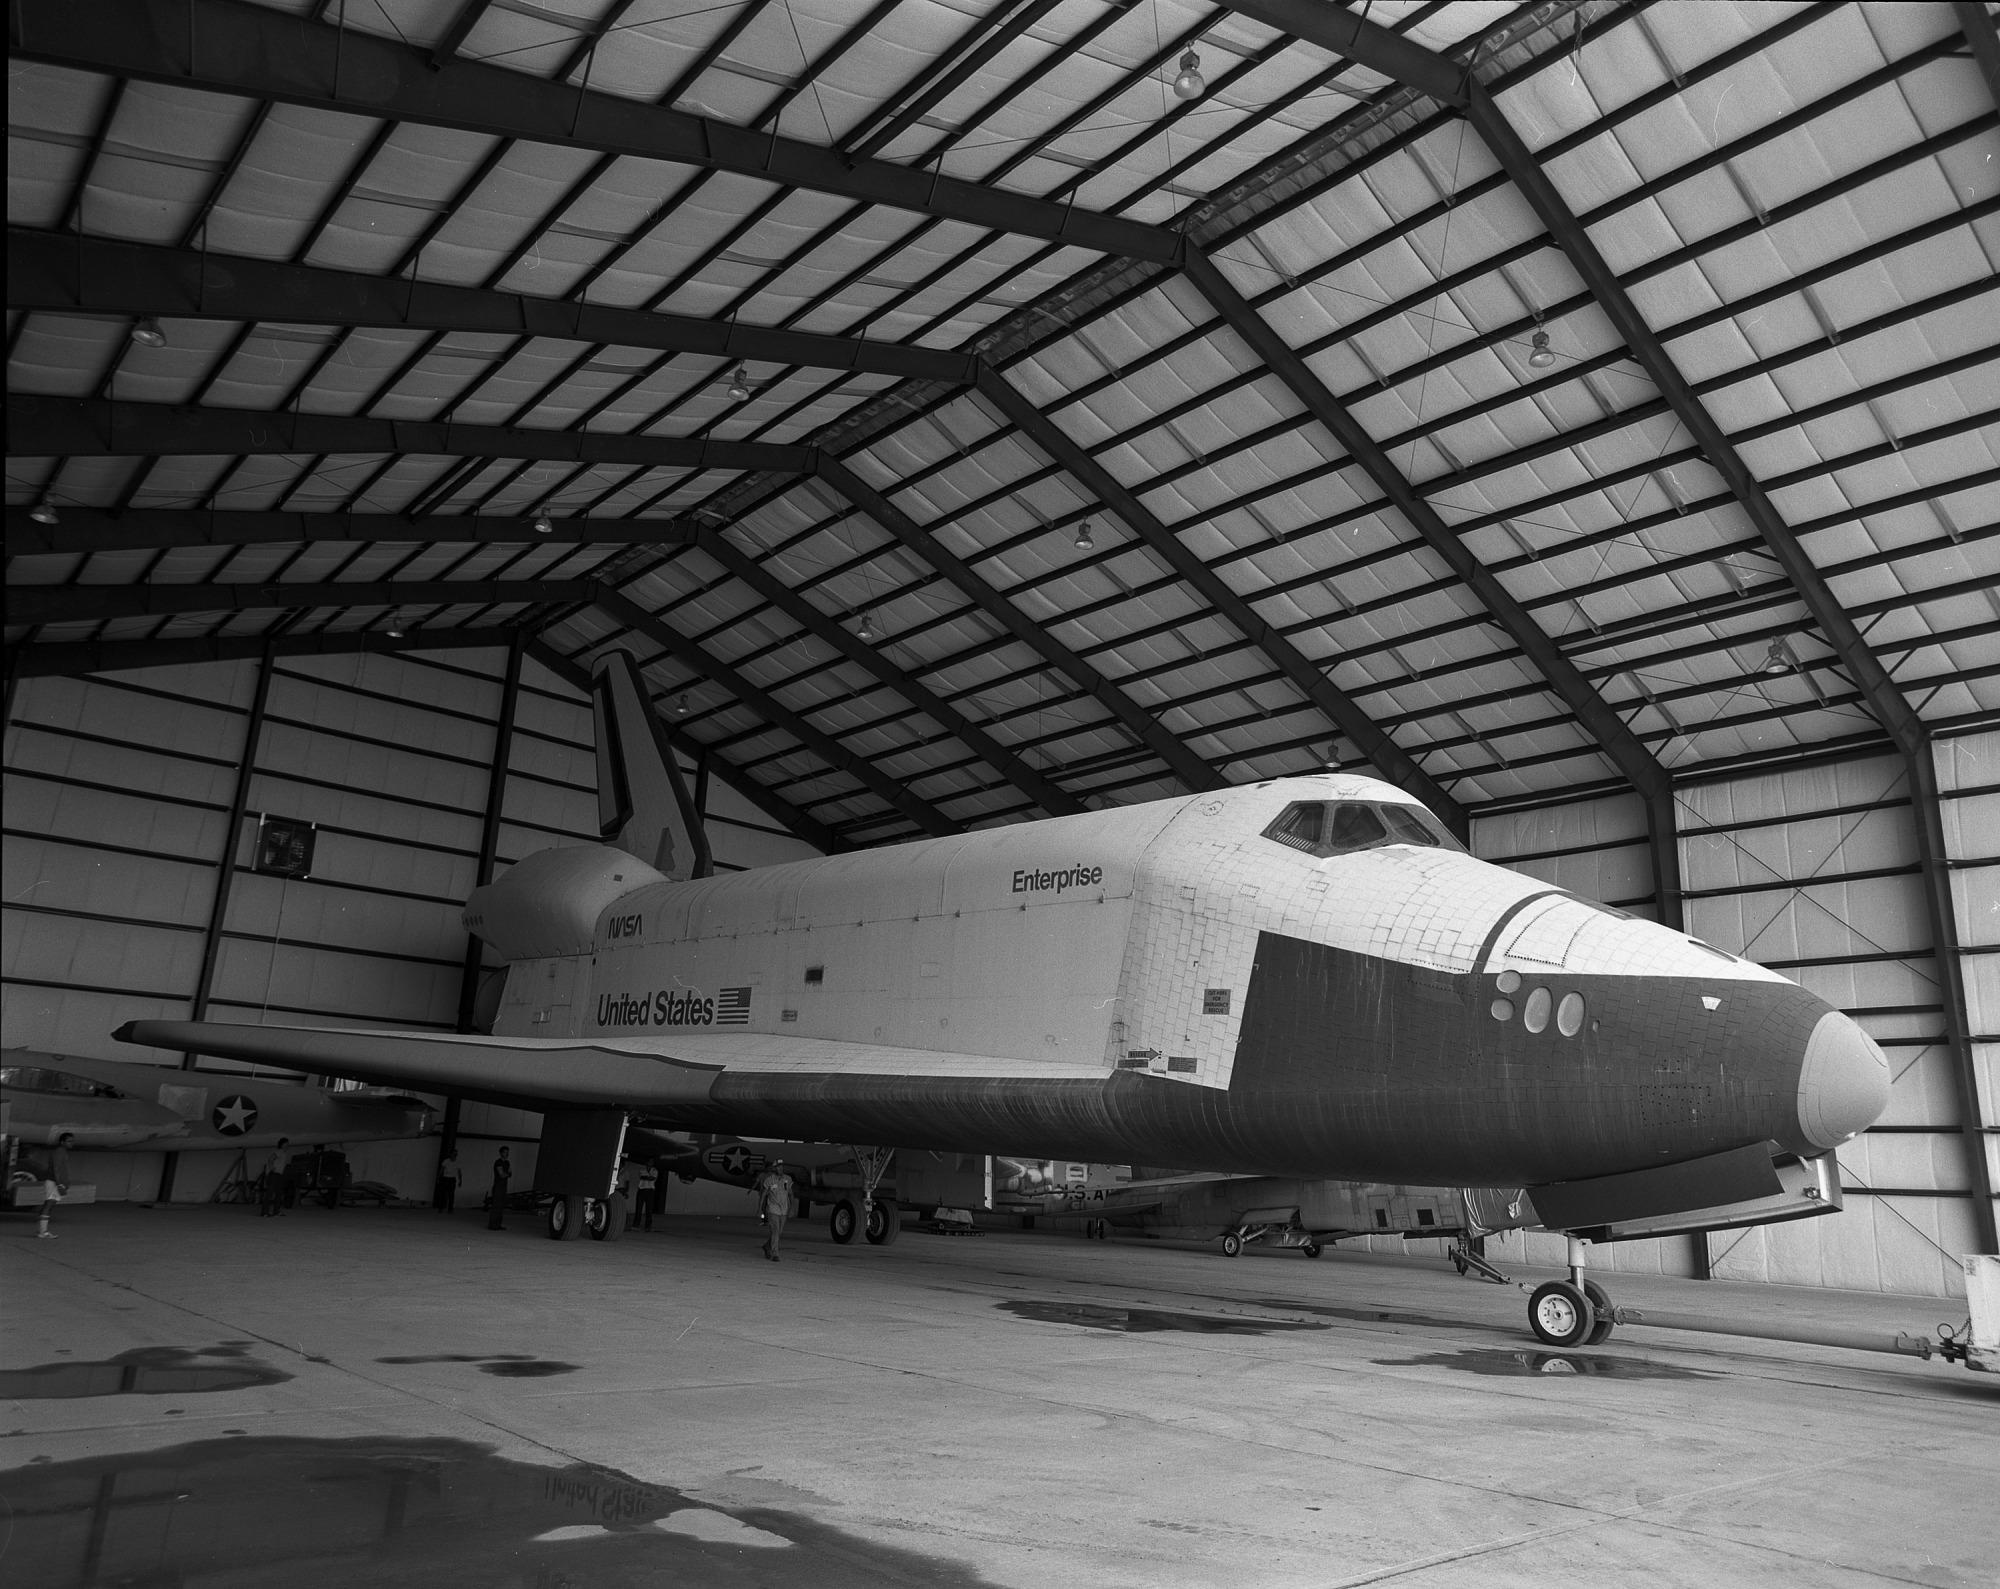 Space Shuttle Enterprise at Dulles Airport